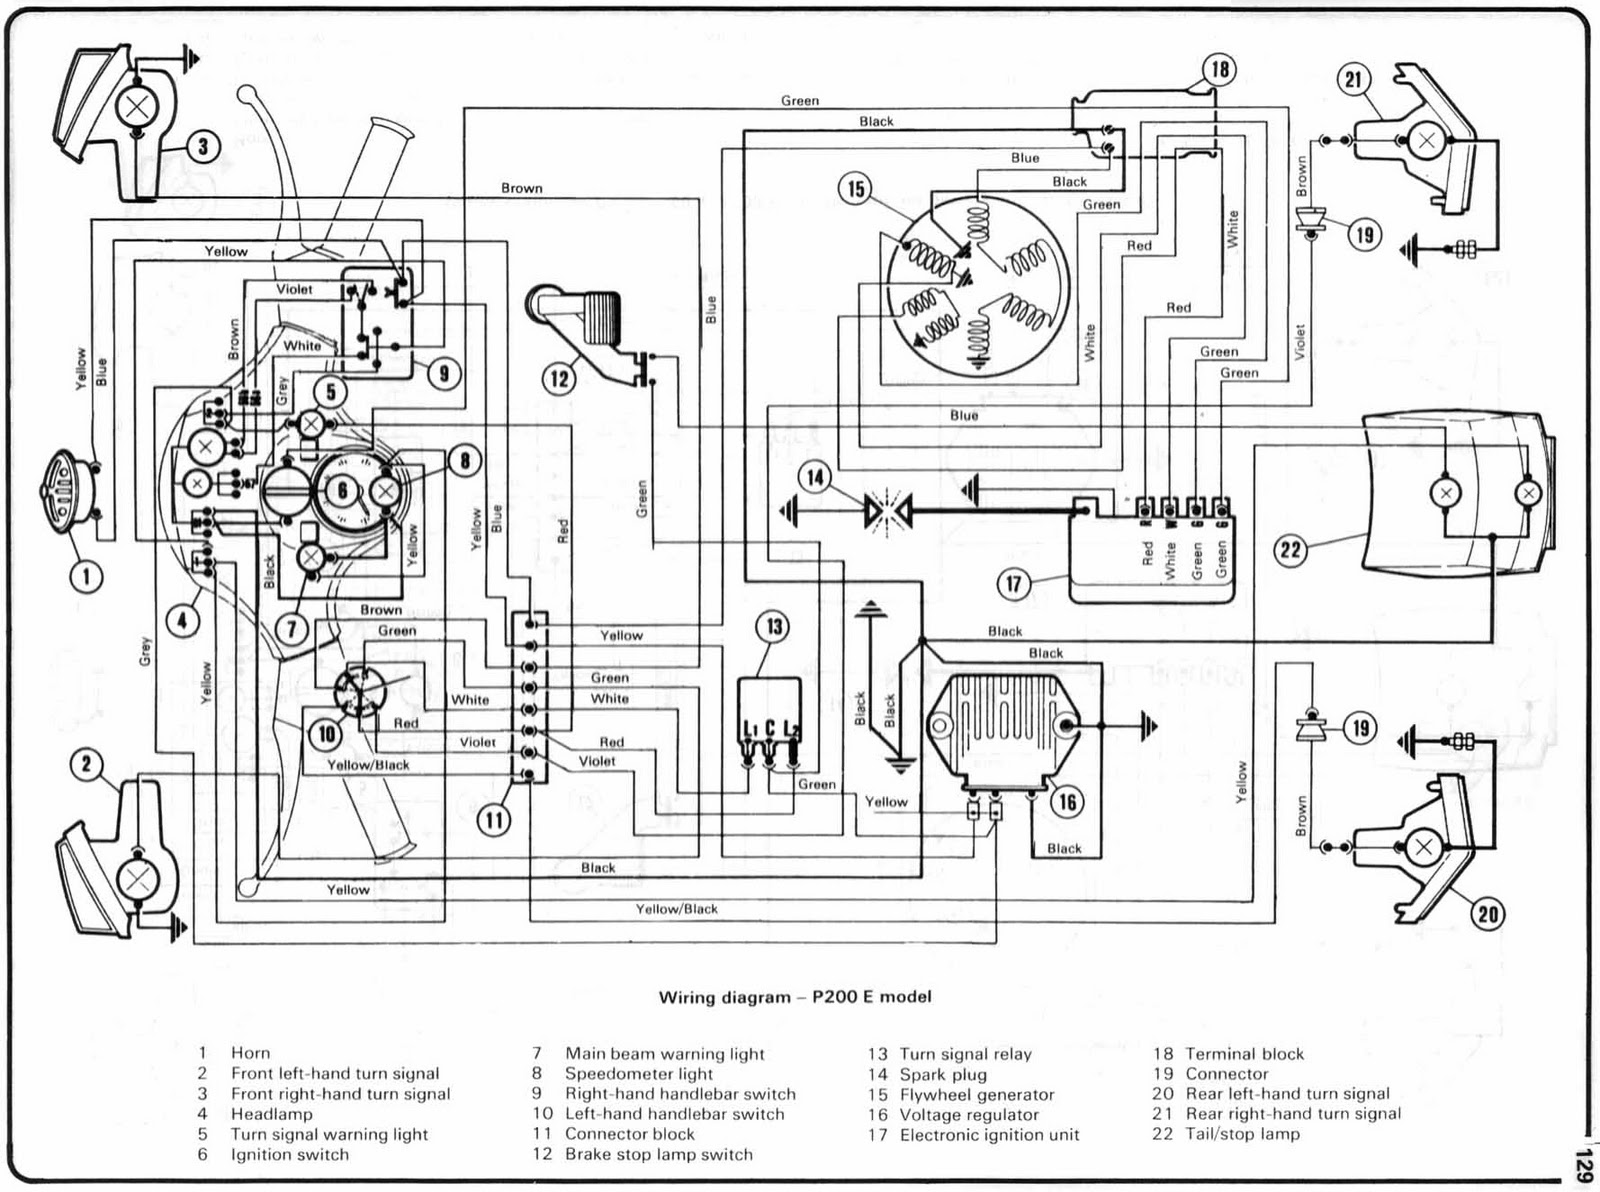 2004 ford freestar wiring diagram 98 explorer radio for mercury monterey free